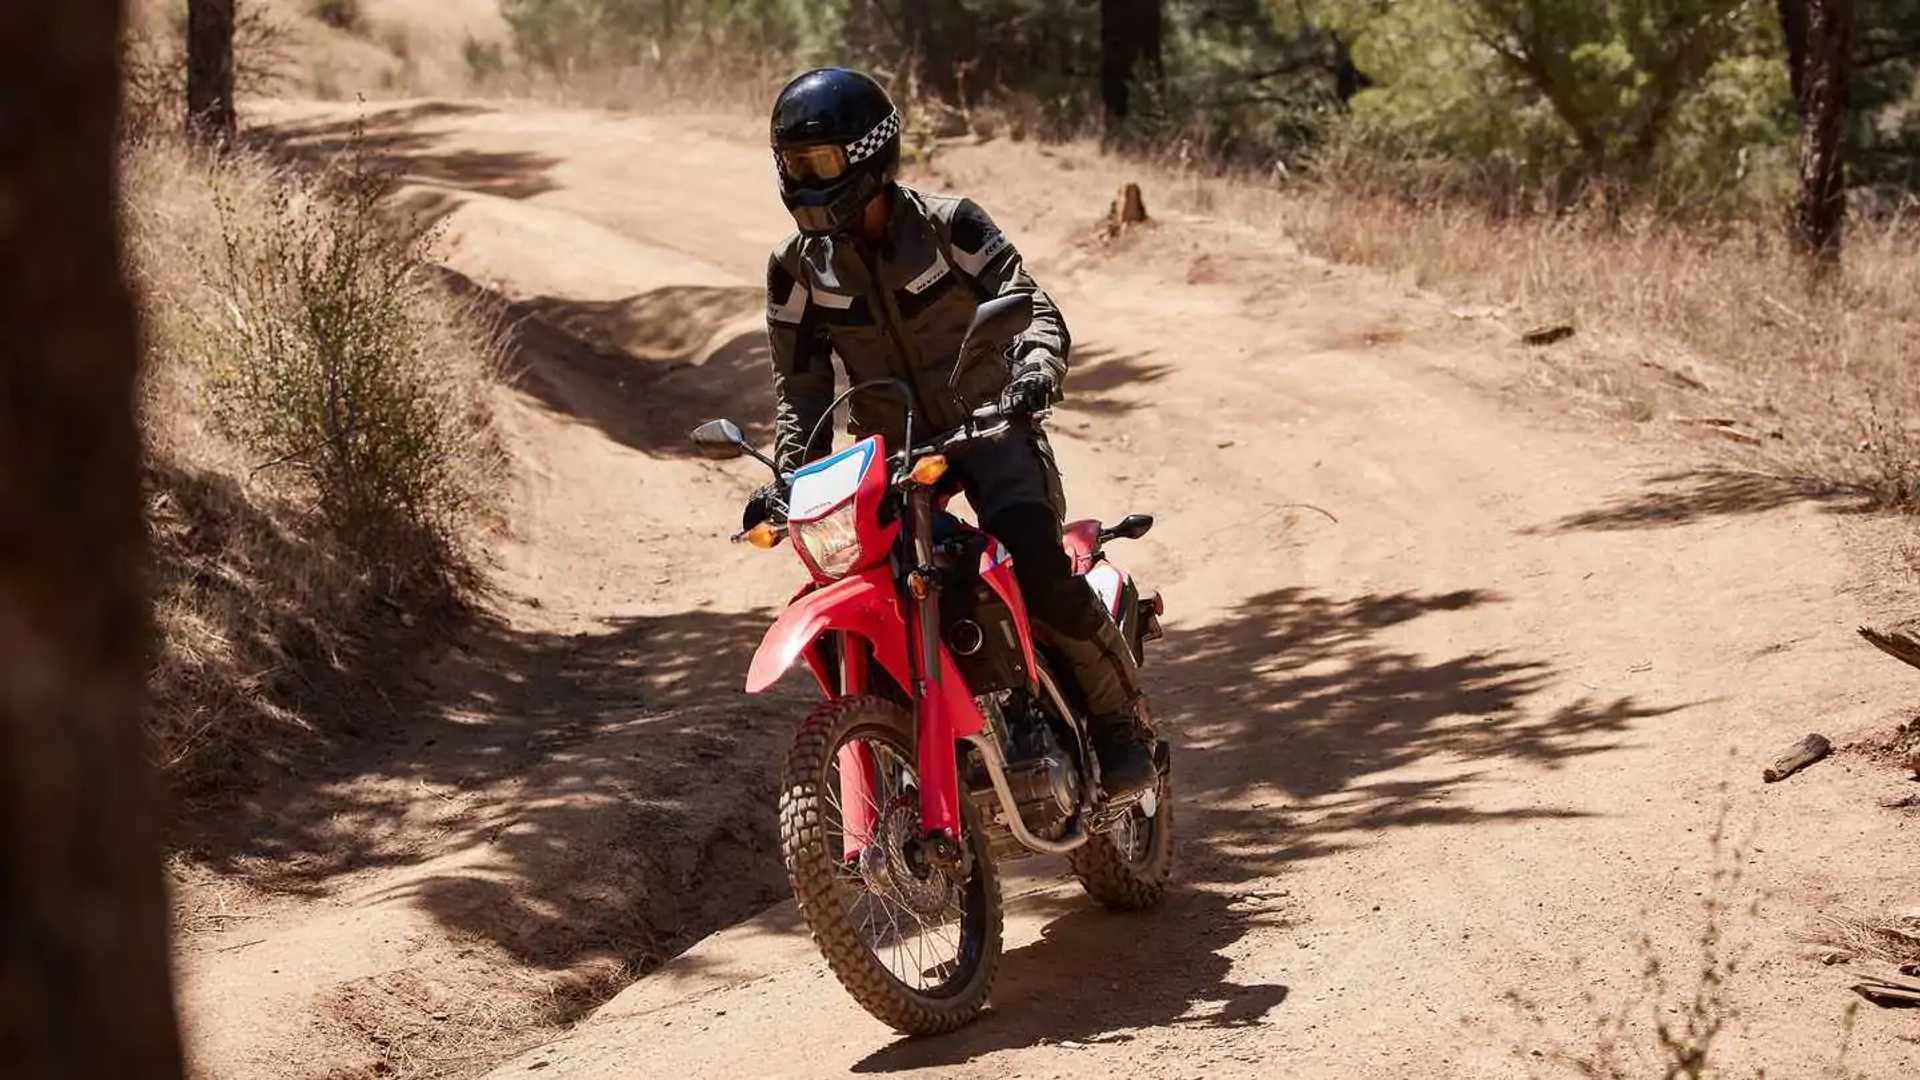 2021 Honda CRF300L - Downhill